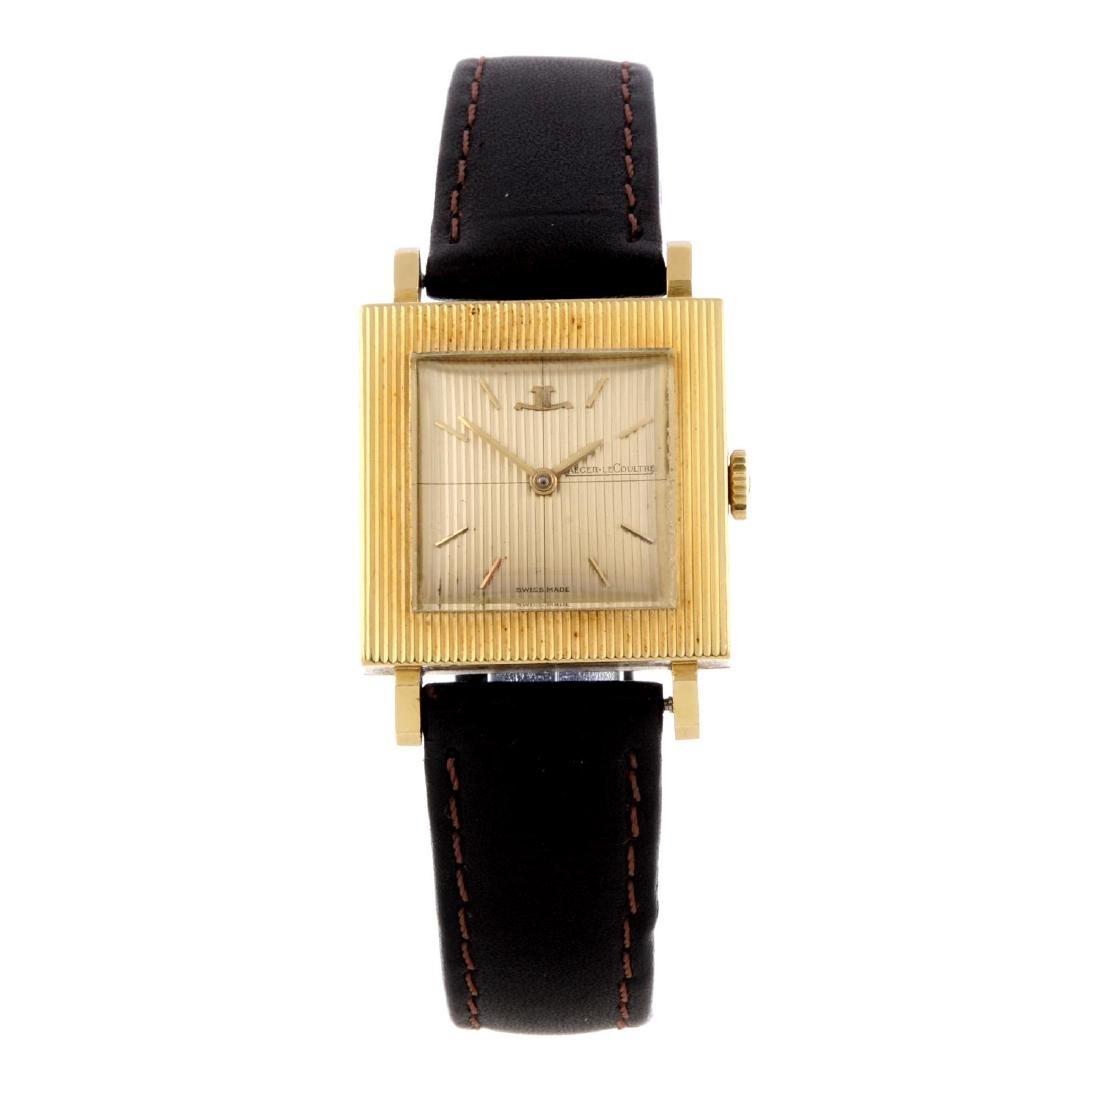 JAEGER-LECOULTRE - a wrist watch. Yellow metal case,